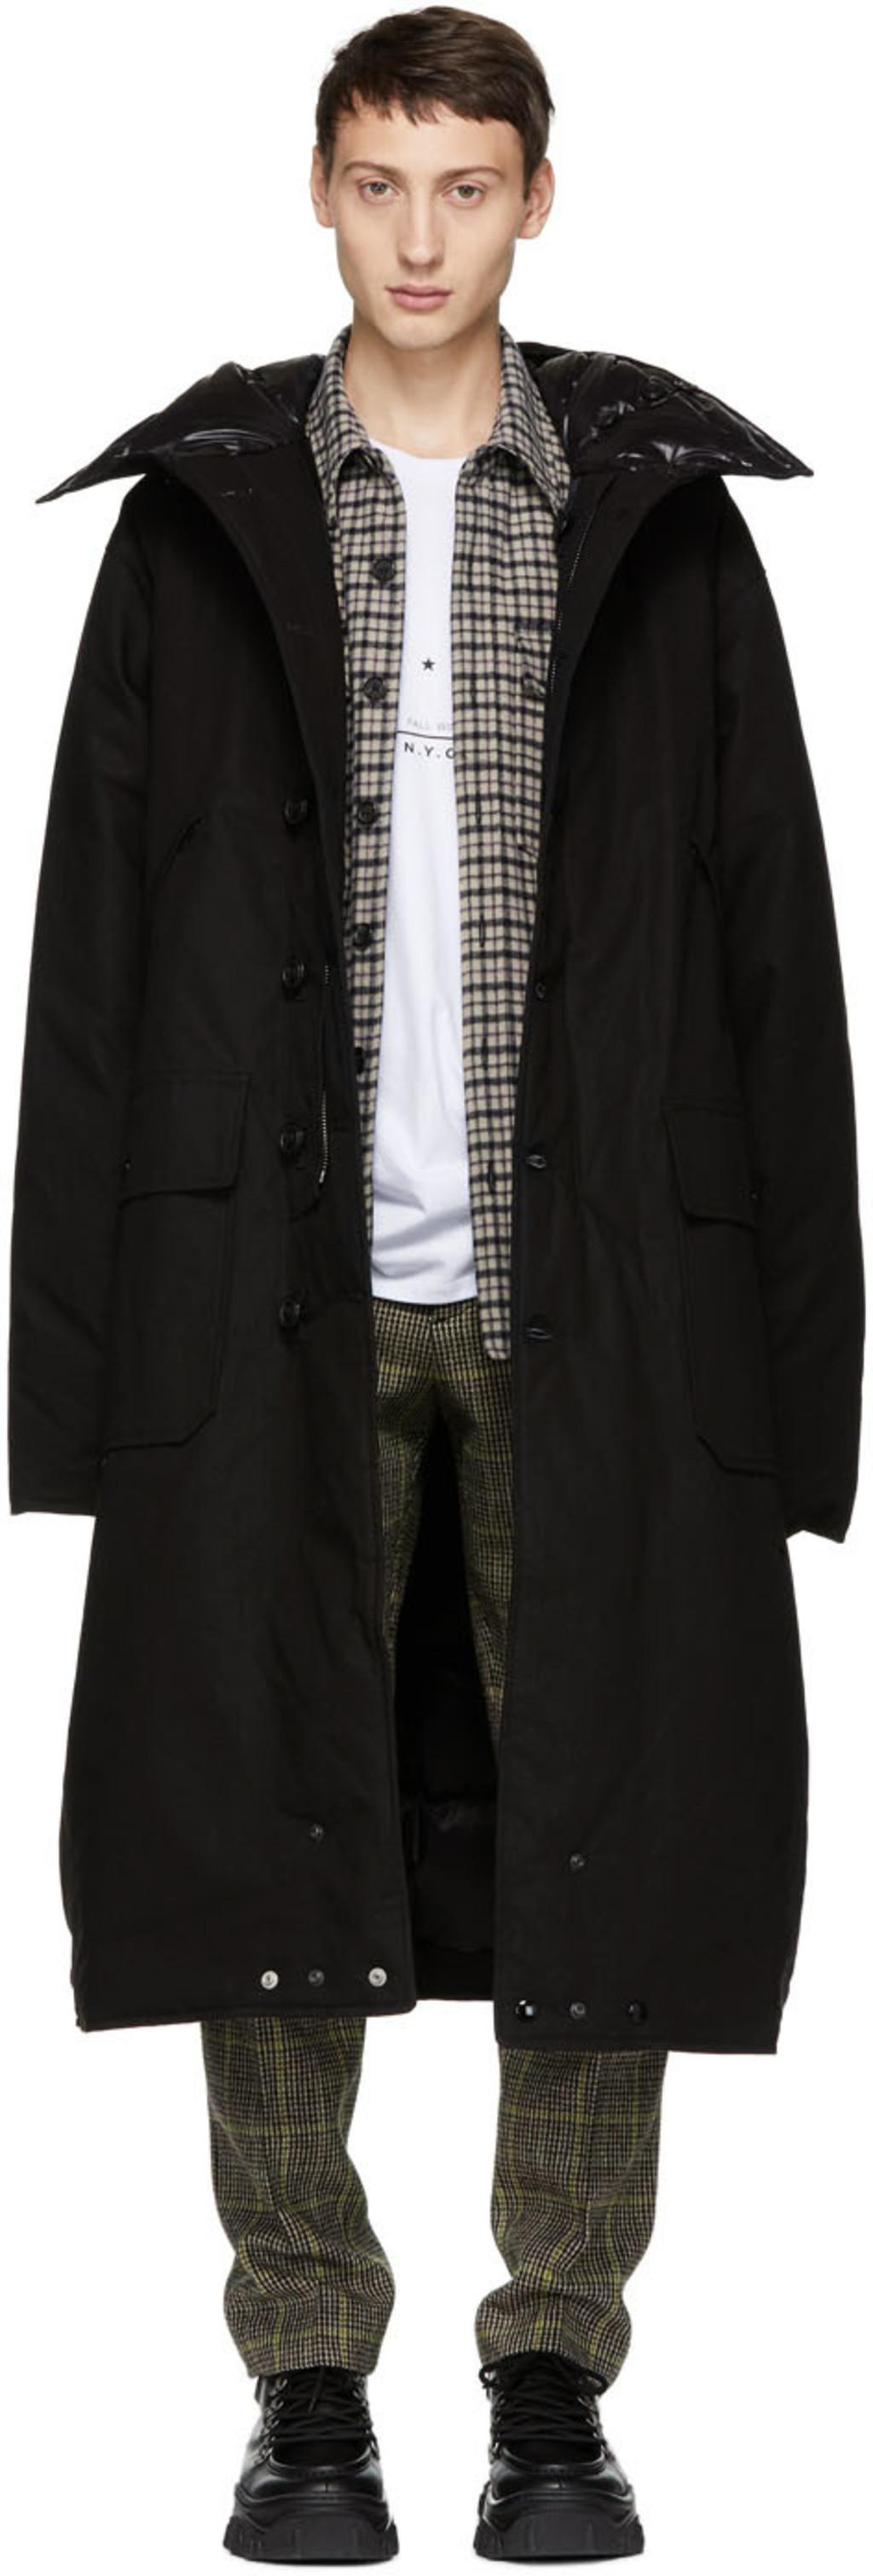 R13 For Men Fw18 Collection Ssense Coat Dan Long Blazer Kate